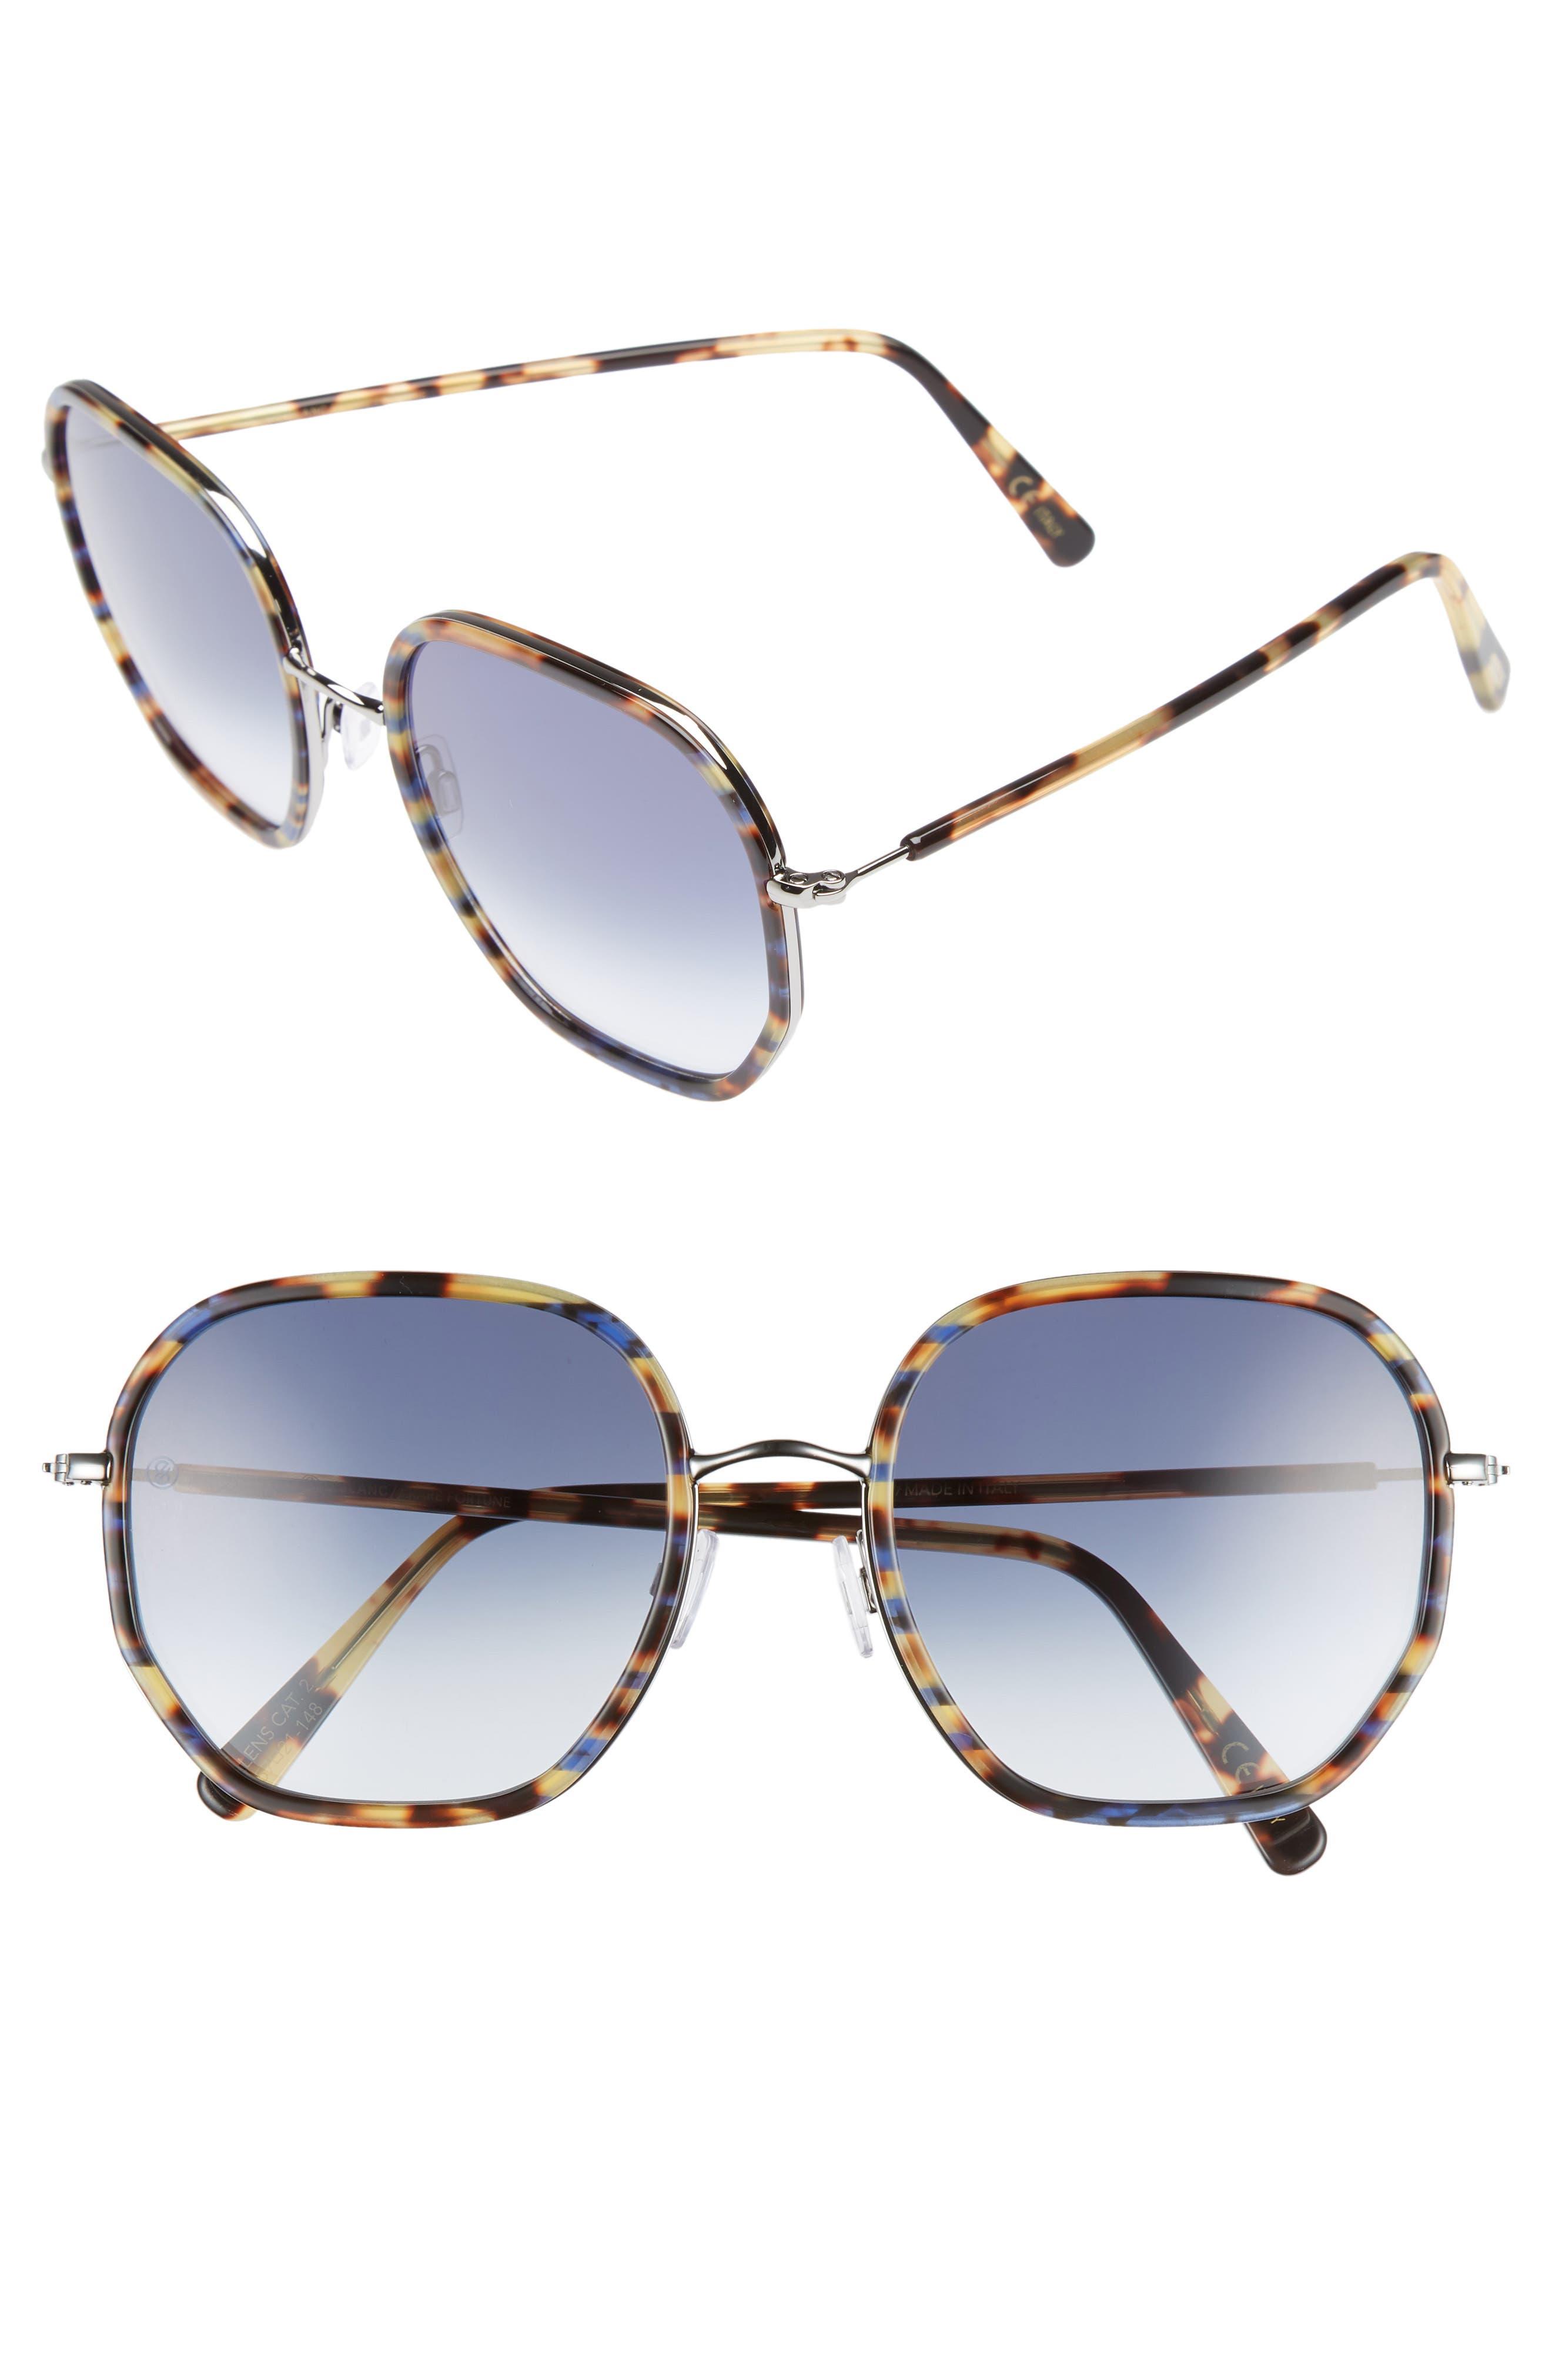 D'BLANC Rare Fortune 59mm Sunglasses,                             Main thumbnail 1, color,                             INDIGO TORTOISE